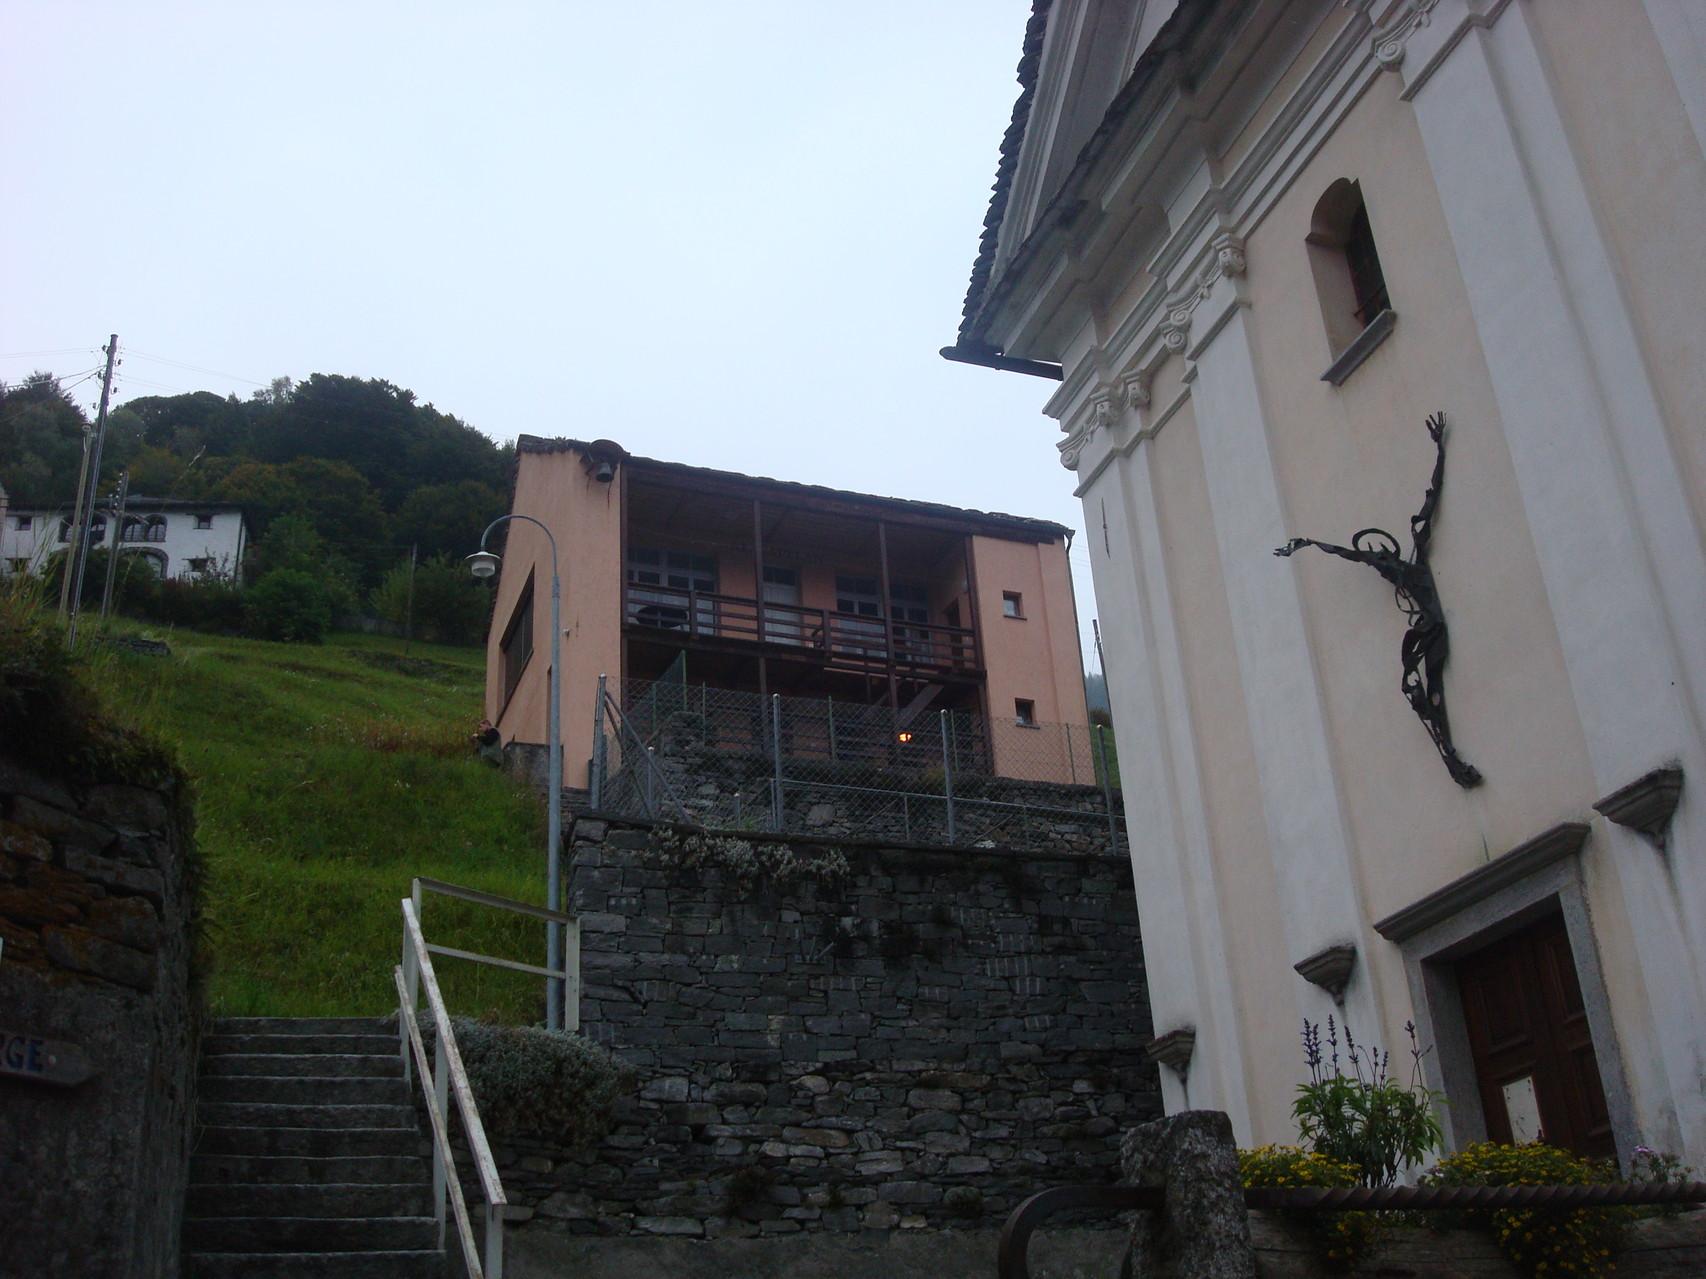 Jugendherberge in Spruga